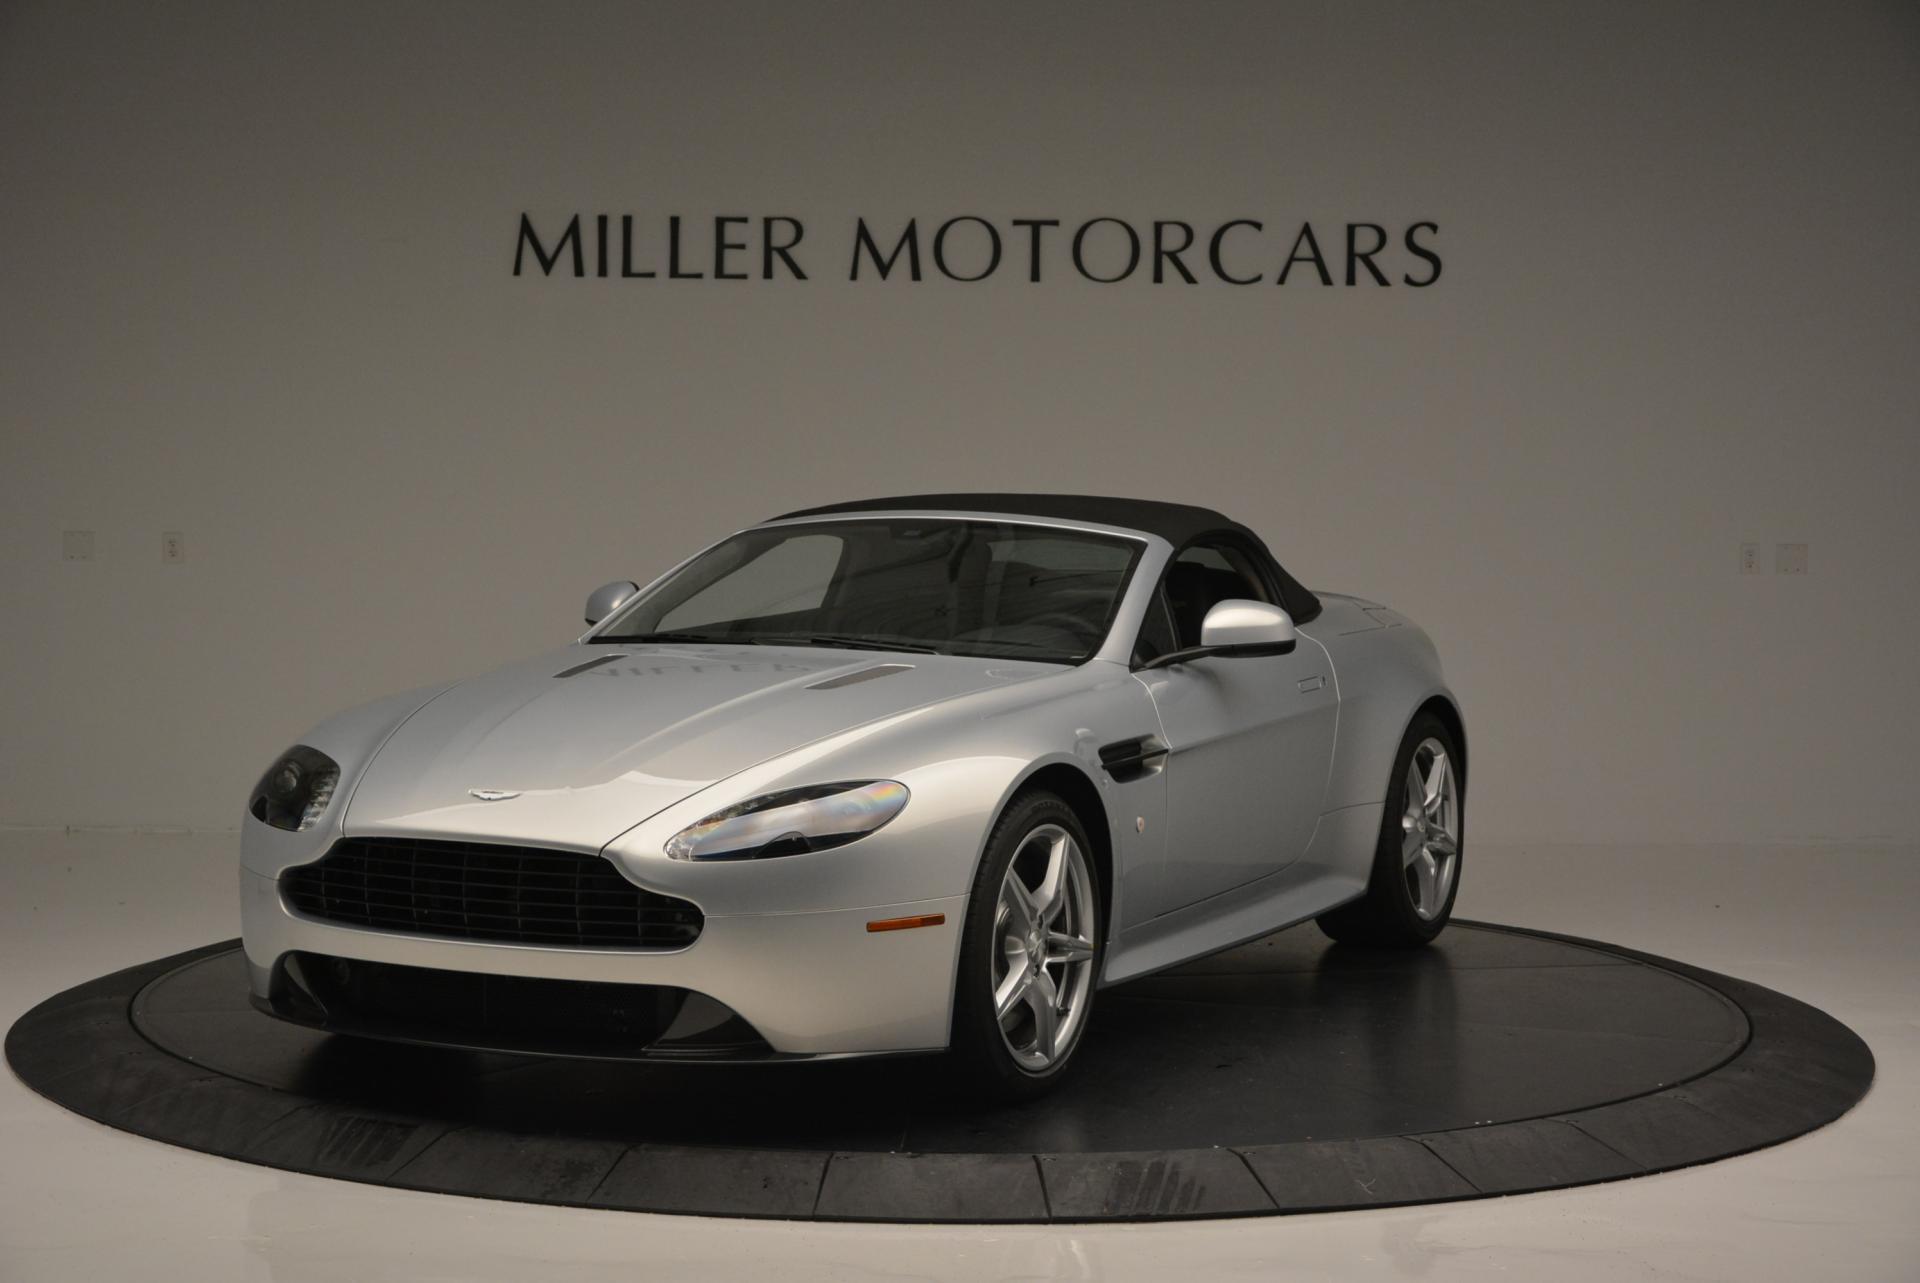 New 2016 Aston Martin V8 Vantage GTS Roadster | Greenwich, CT